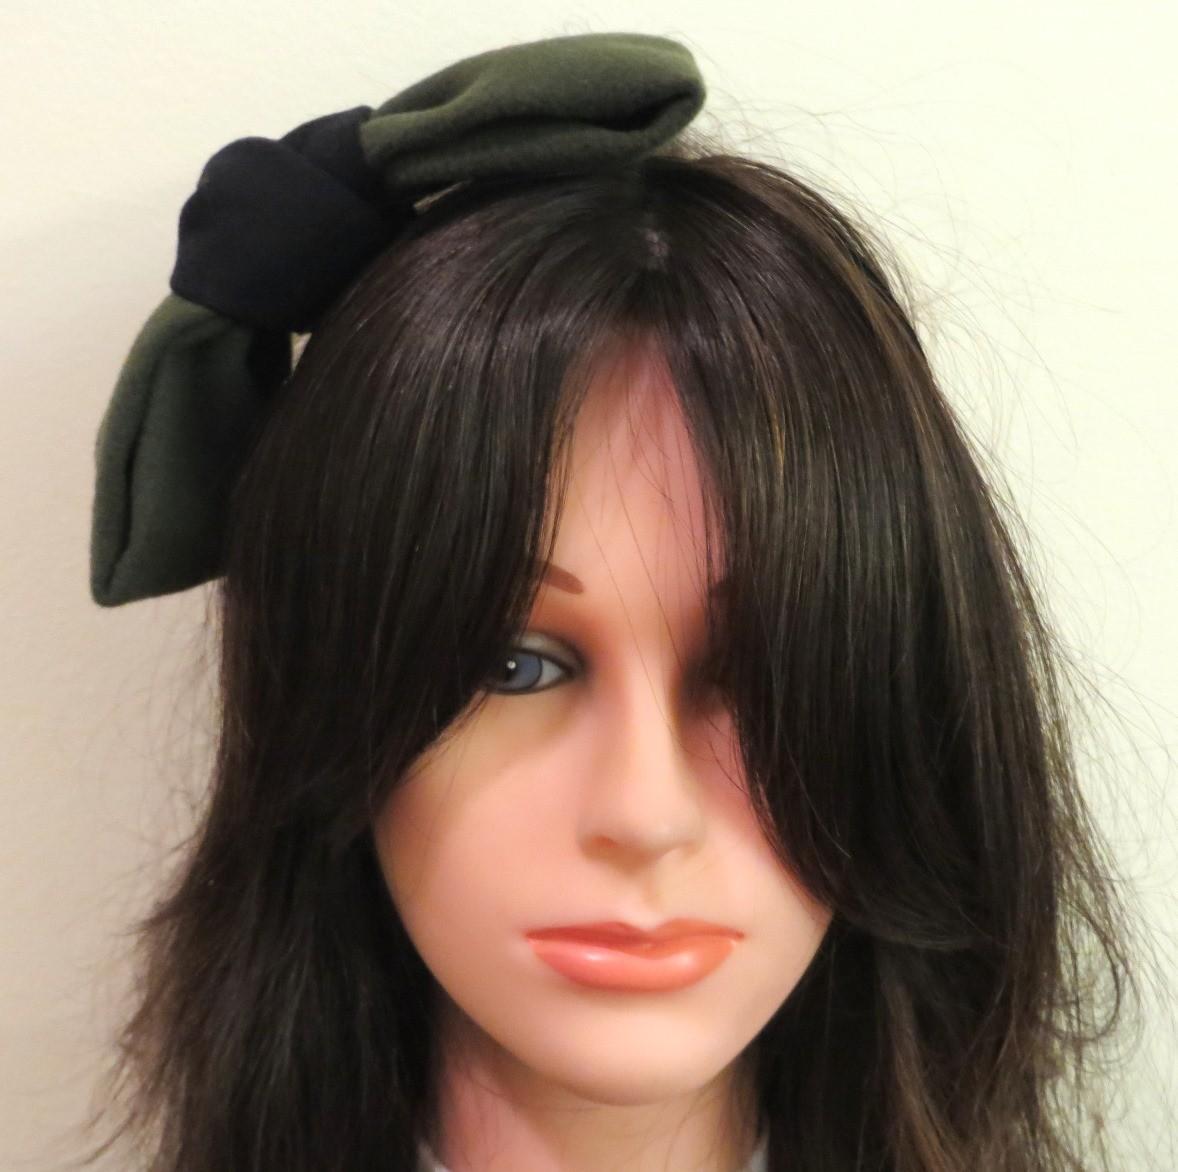 Green felt large bow headband